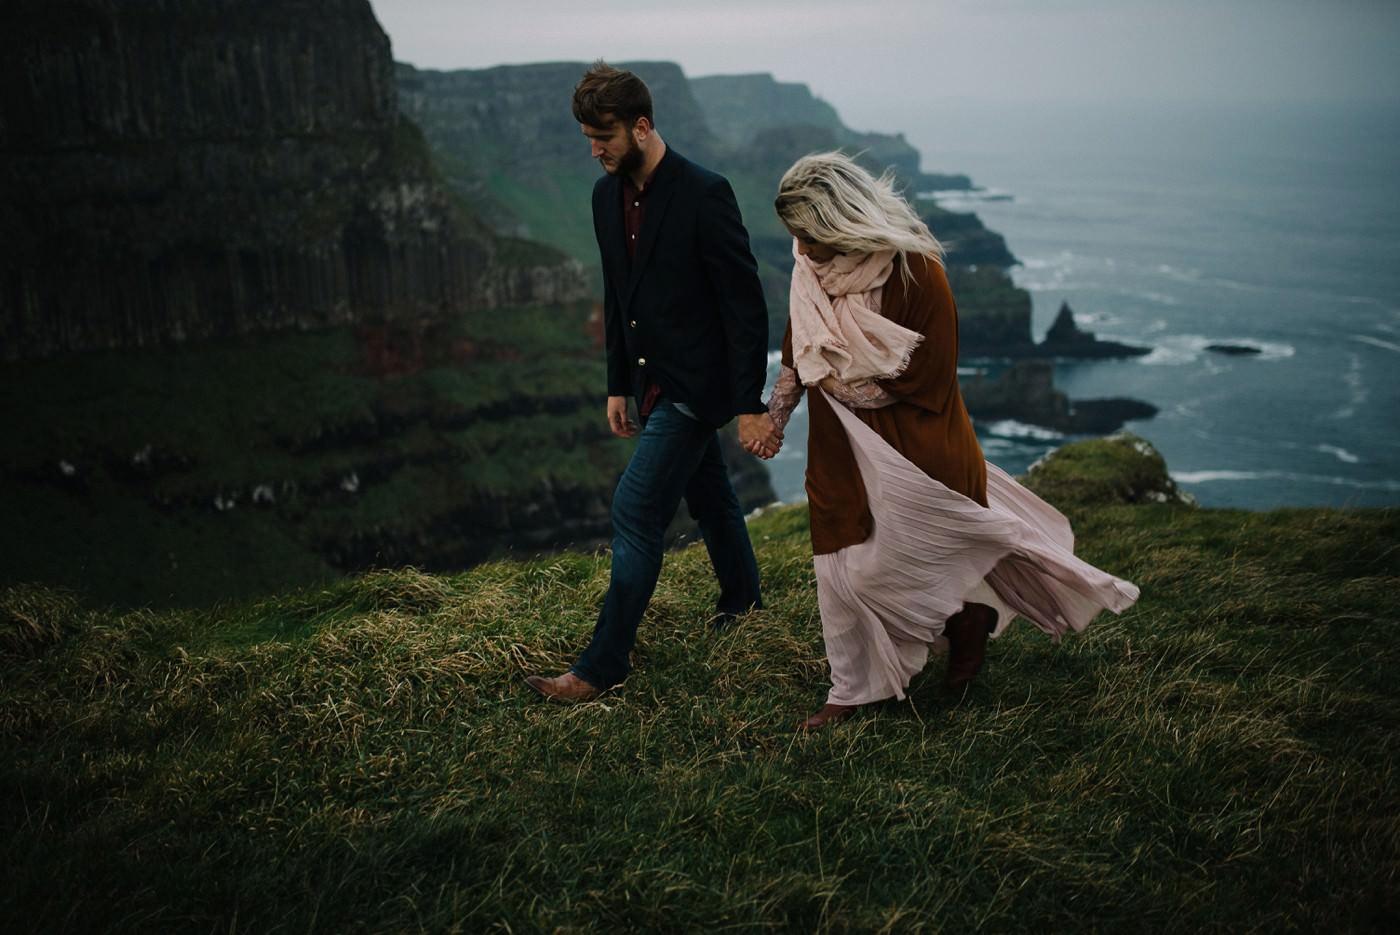 Engagement Photography Giants Causeway wedding photographer northern Ireland